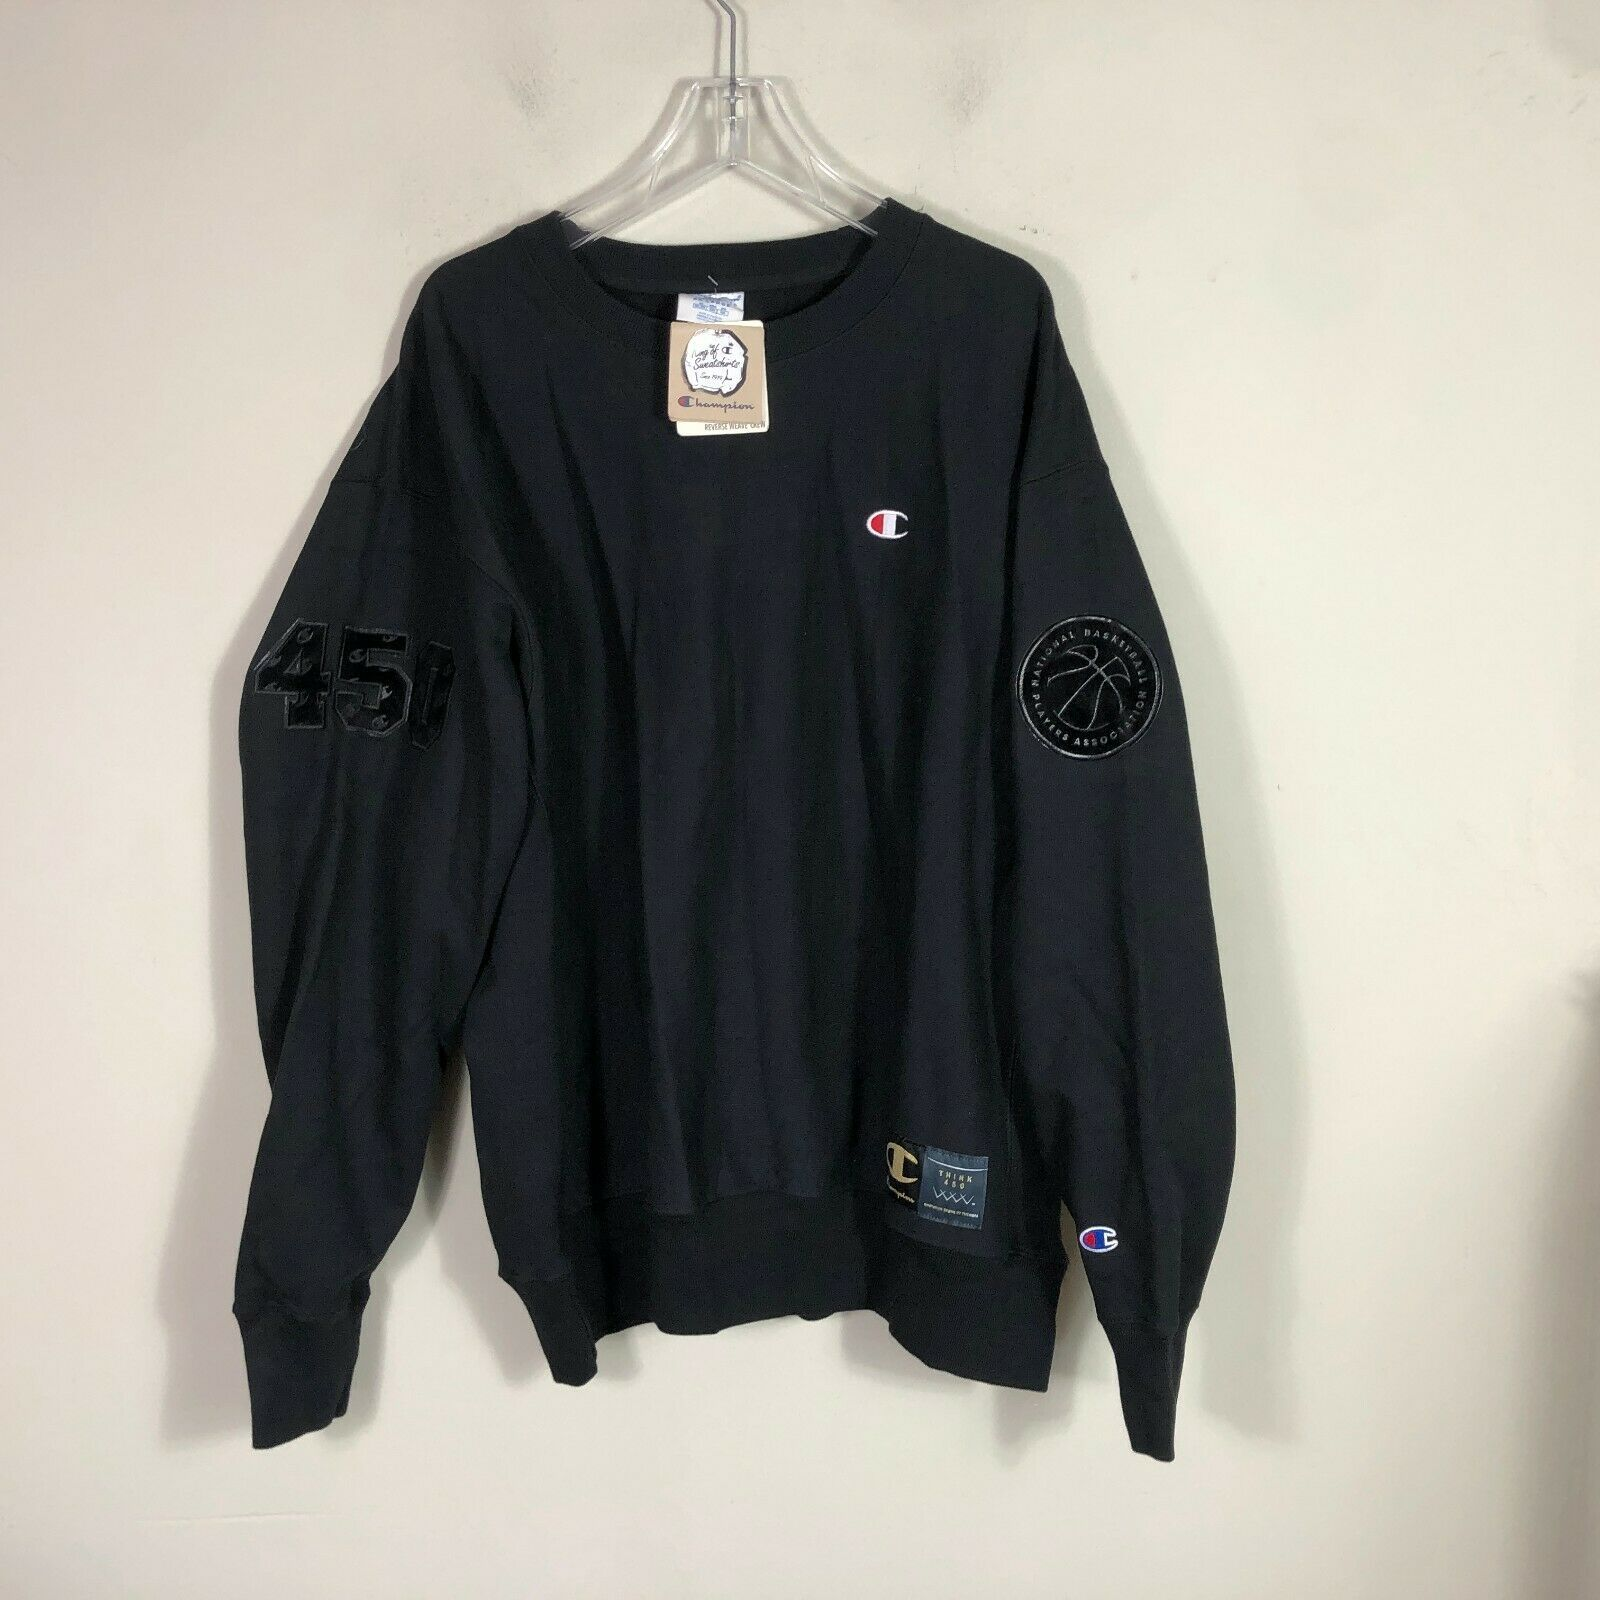 Vintage Champion Crew Neck Reverse Weave Sweatshirt 2XL NBA NBPA Sweatshirt NWT image 9